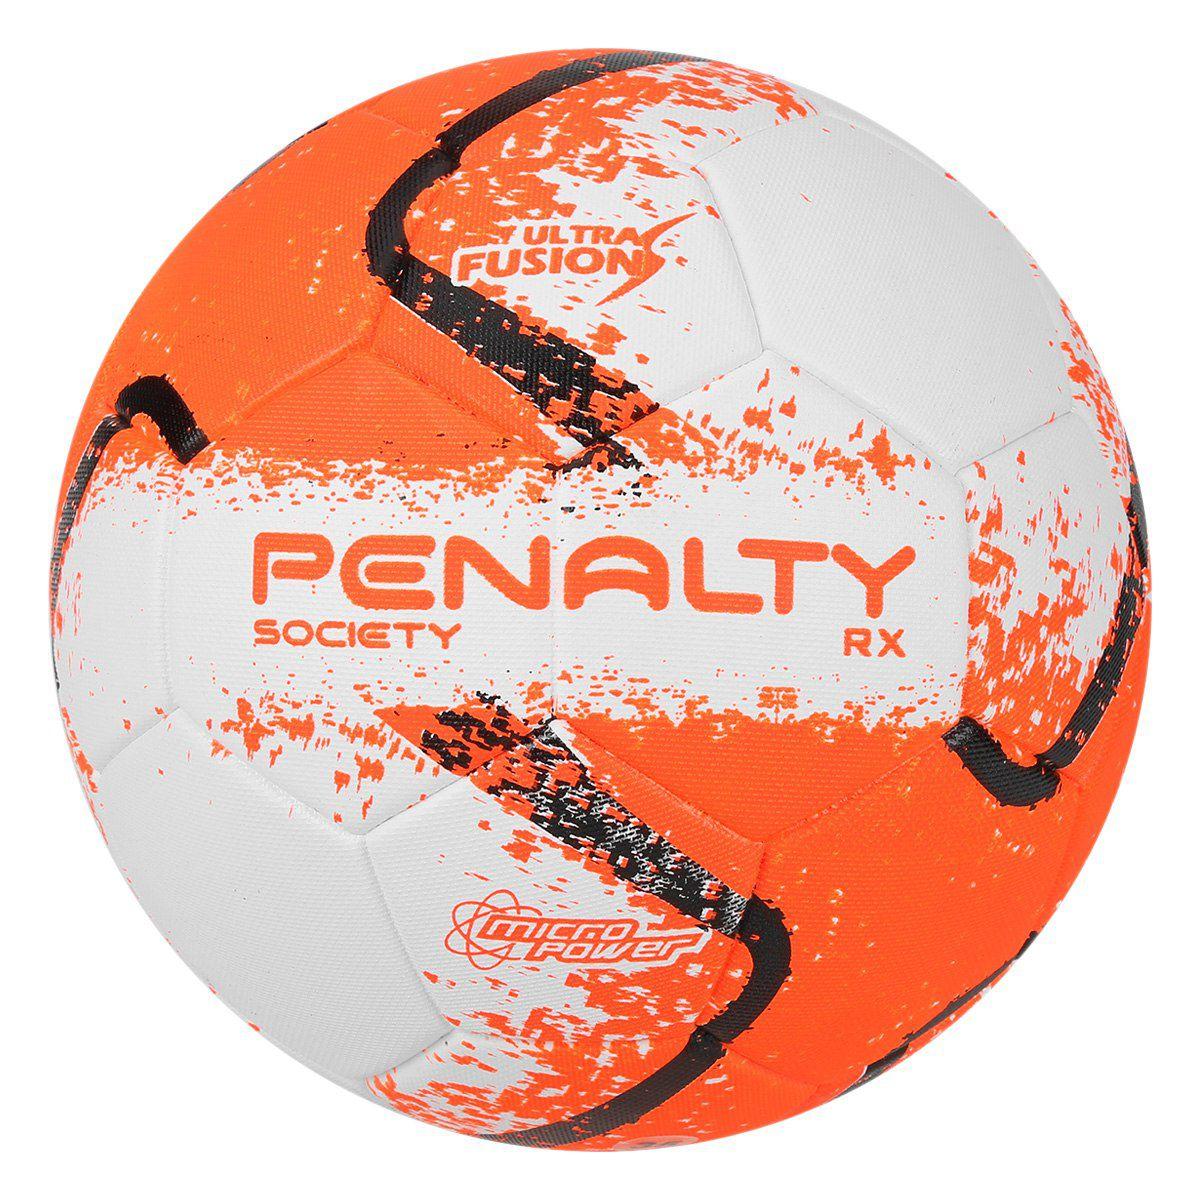 7cac3e77c3 Bola Futebol Society Penalty RX R2 8 Fusion - Energia Esportes